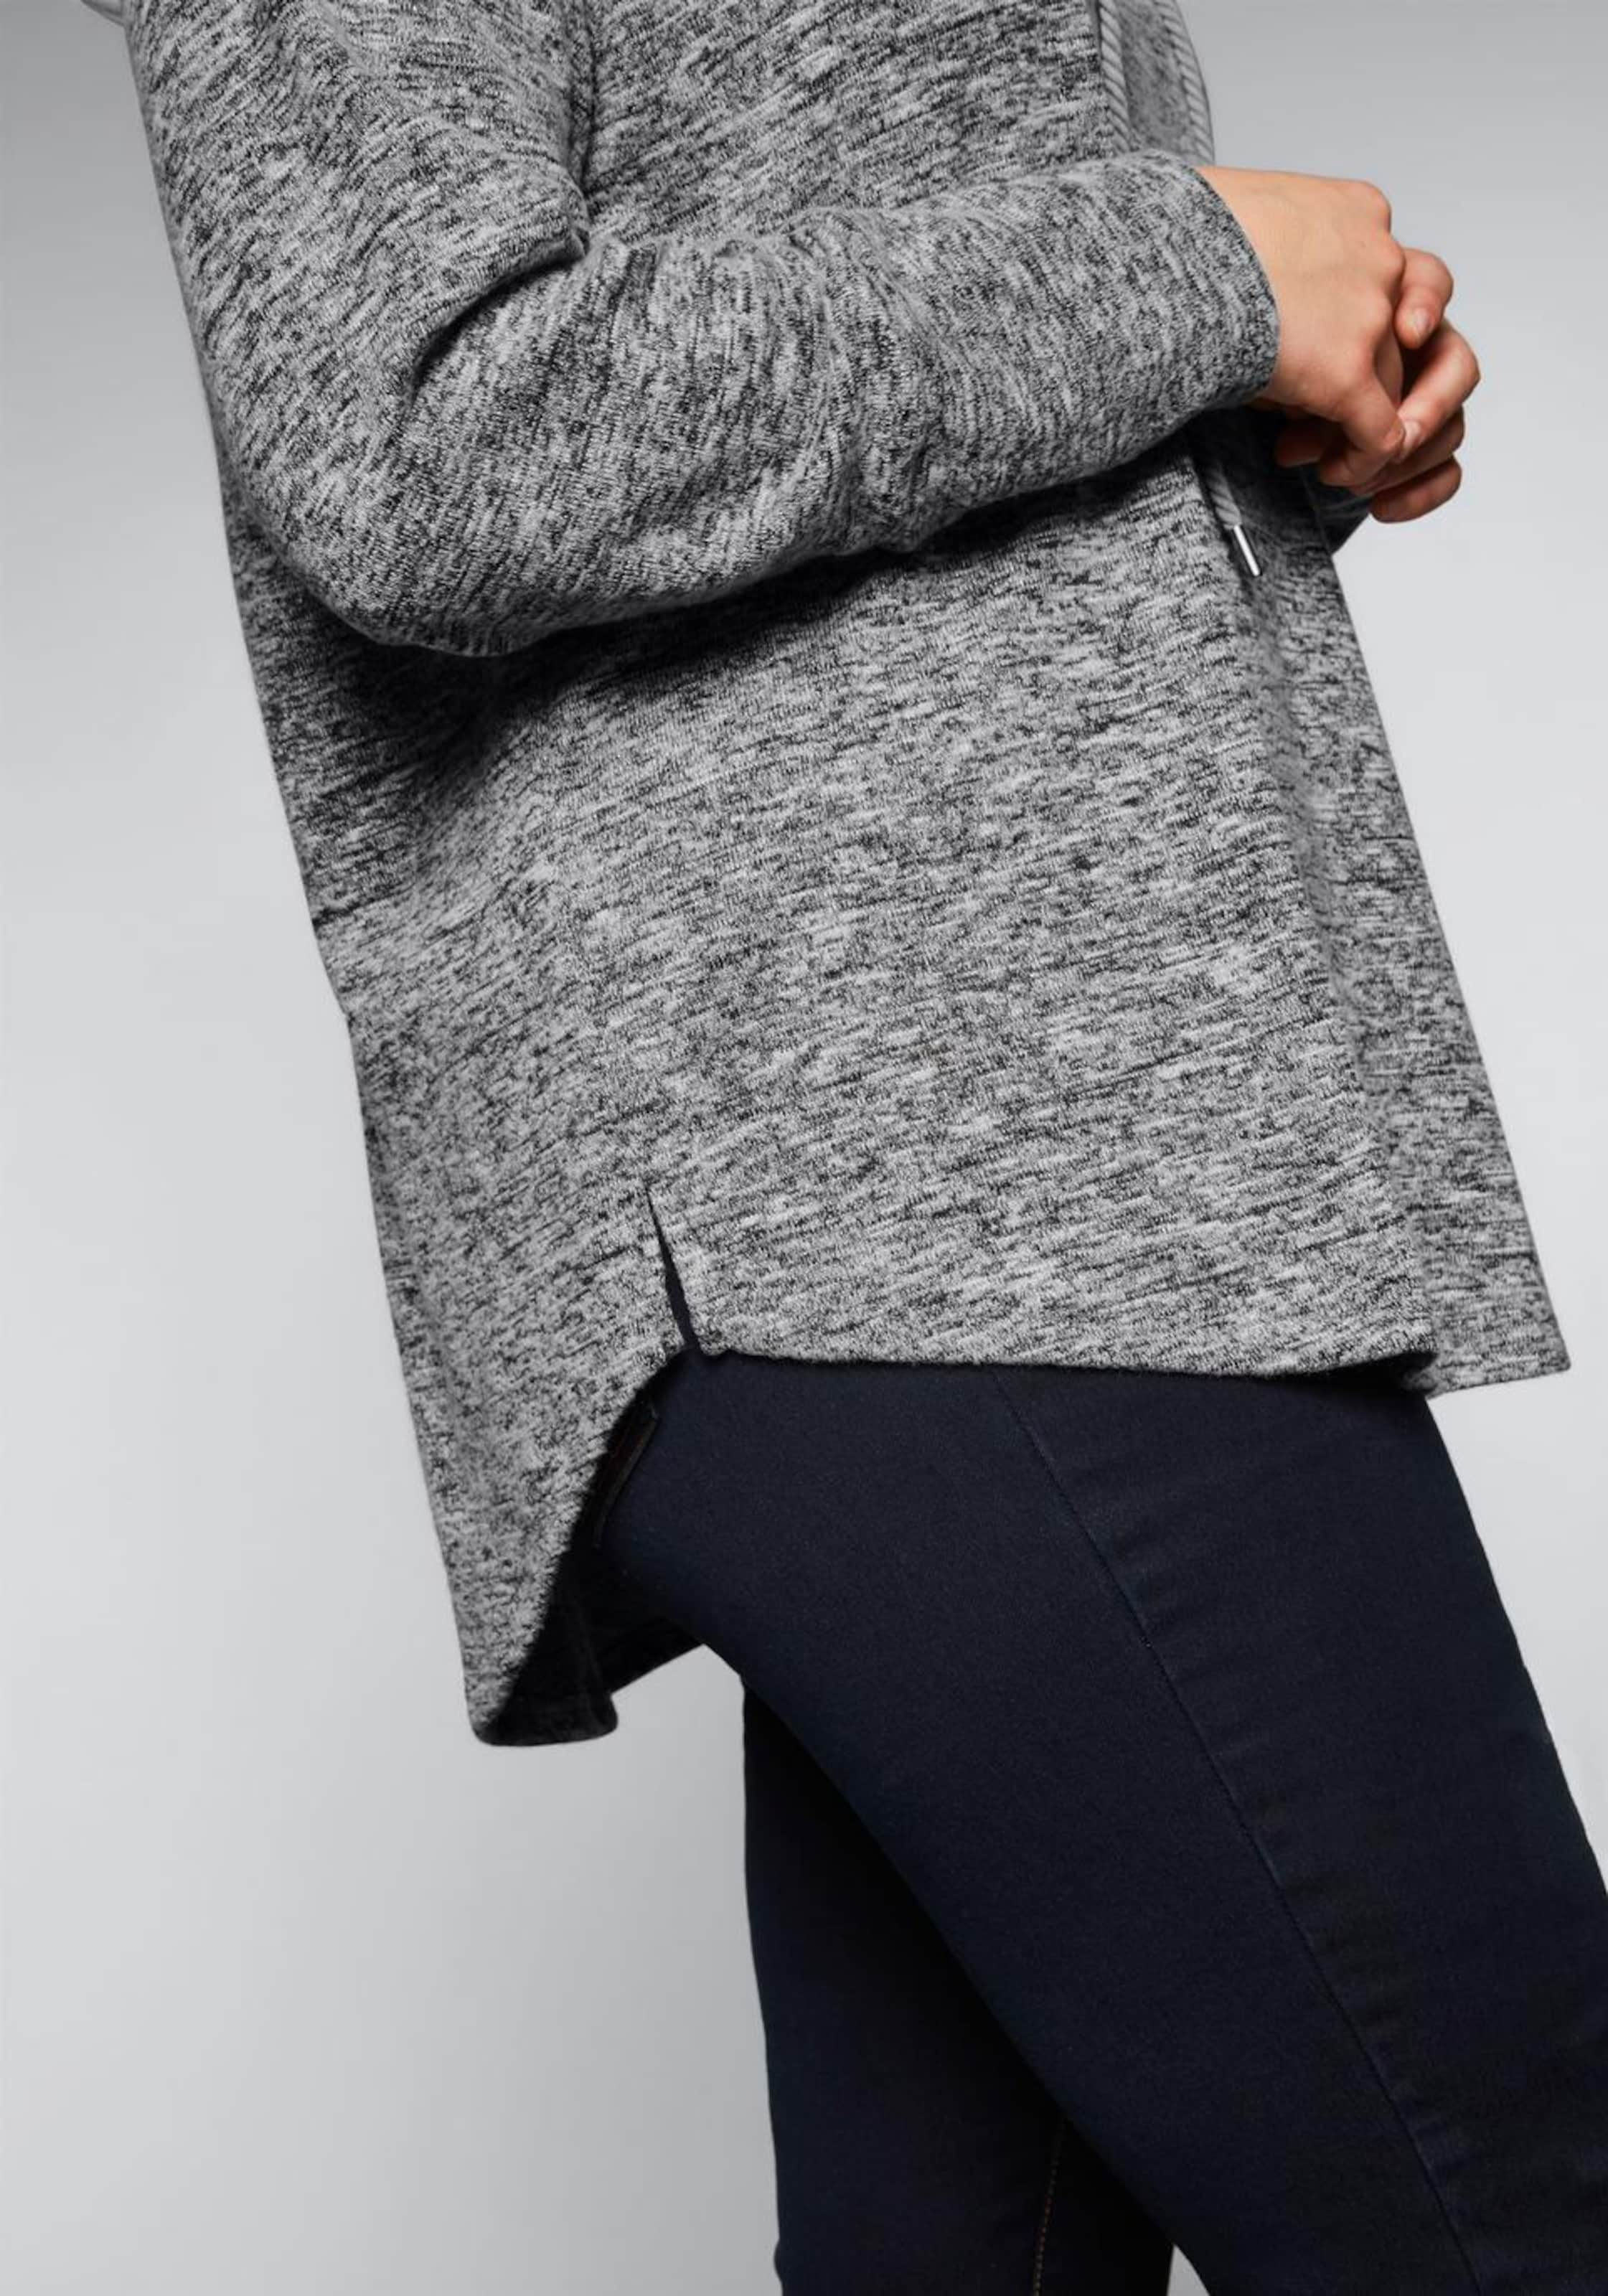 In Sheego Sweatshirt Sweatshirt Sweatshirt Sheego In Sheego In Sweatshirt Graumeliert Graumeliert Graumeliert In Sheego CtsrQdh